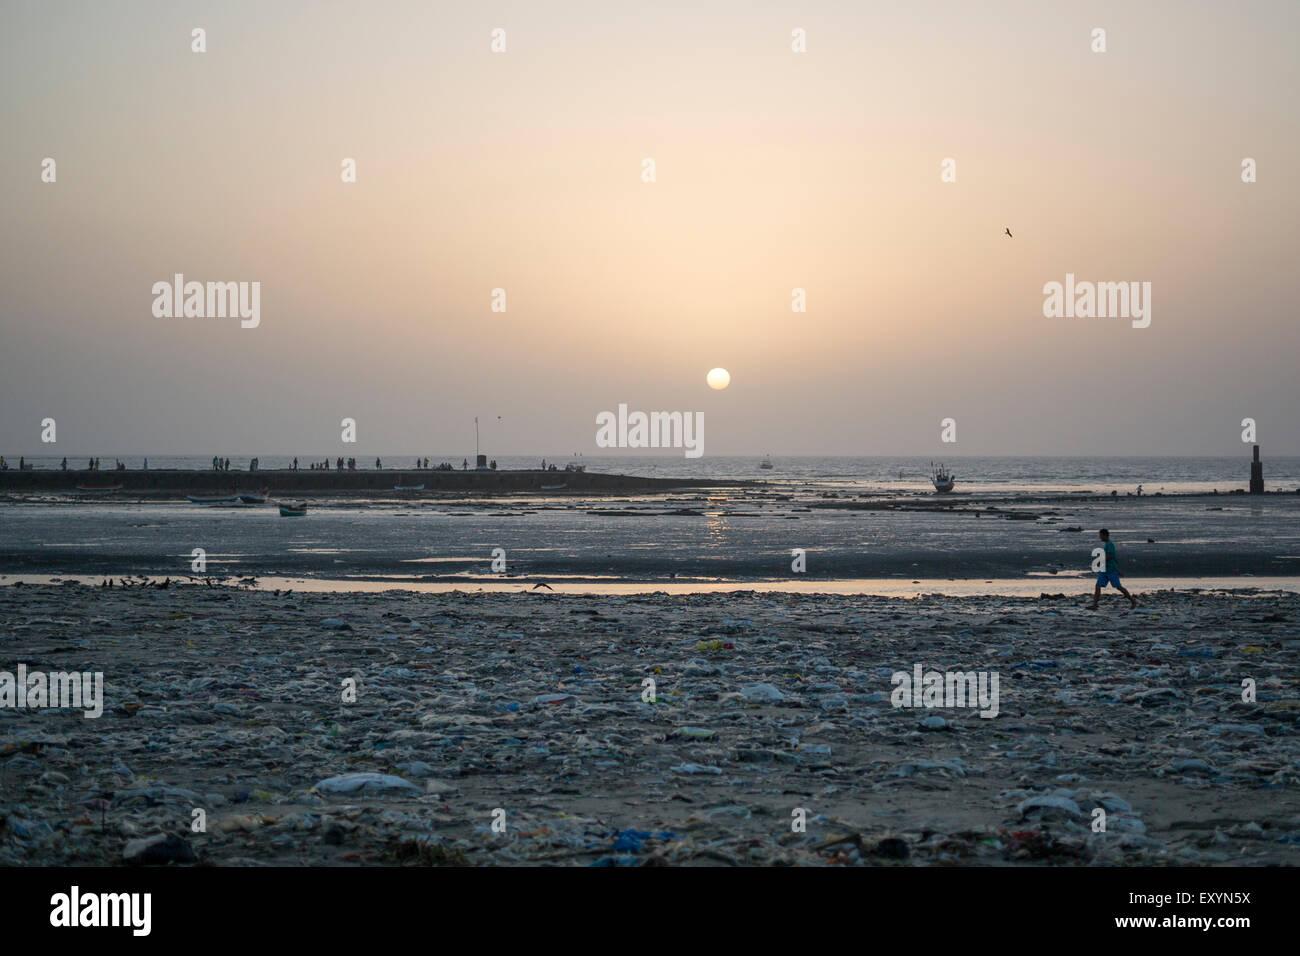 Garbage & plastic lying on a dirty beach in Mumbai, India. - Stock Image